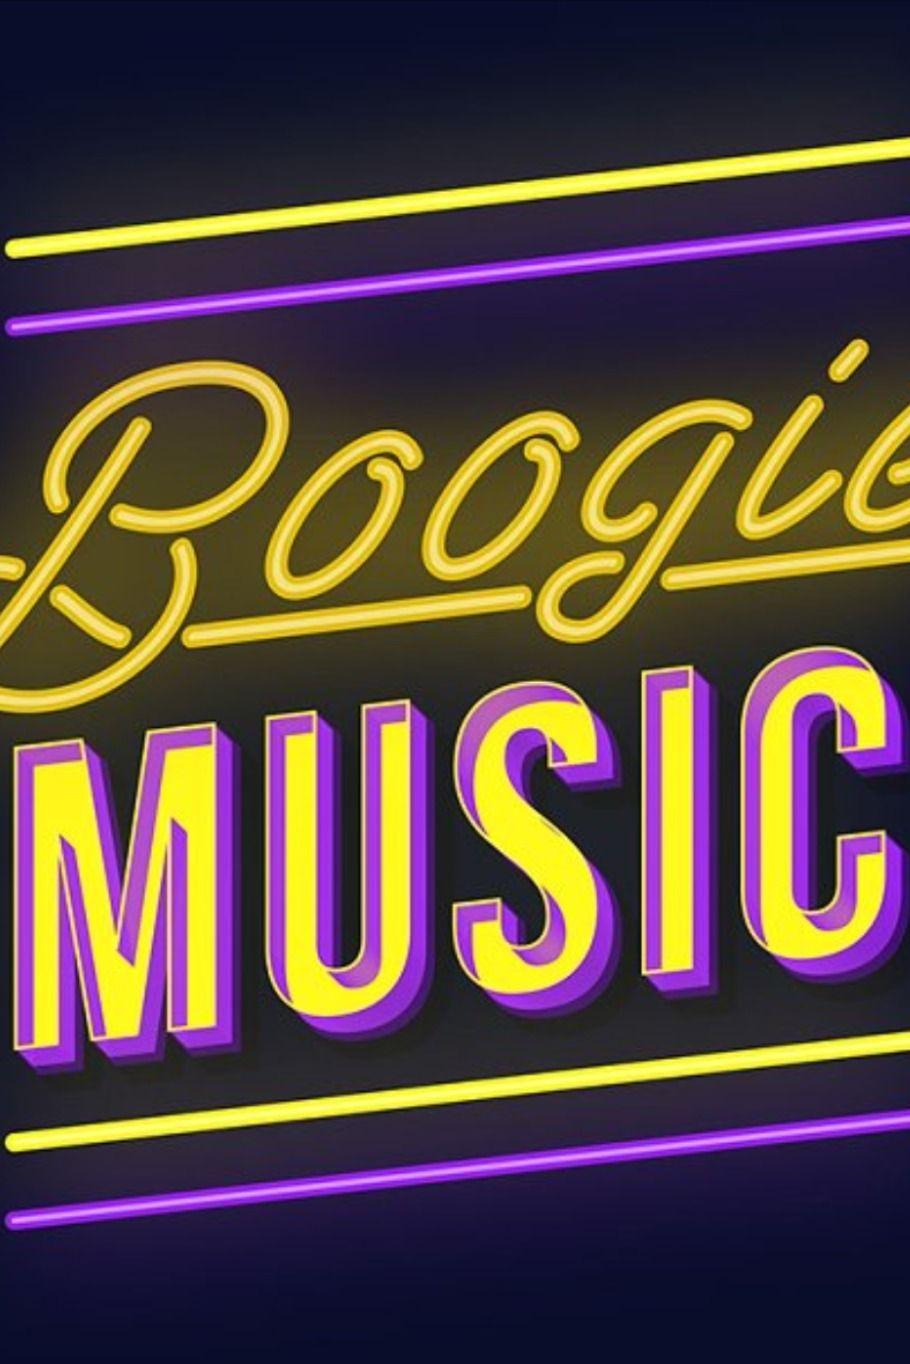 Boogie music vintage 3d lettering in 2020 Lettering